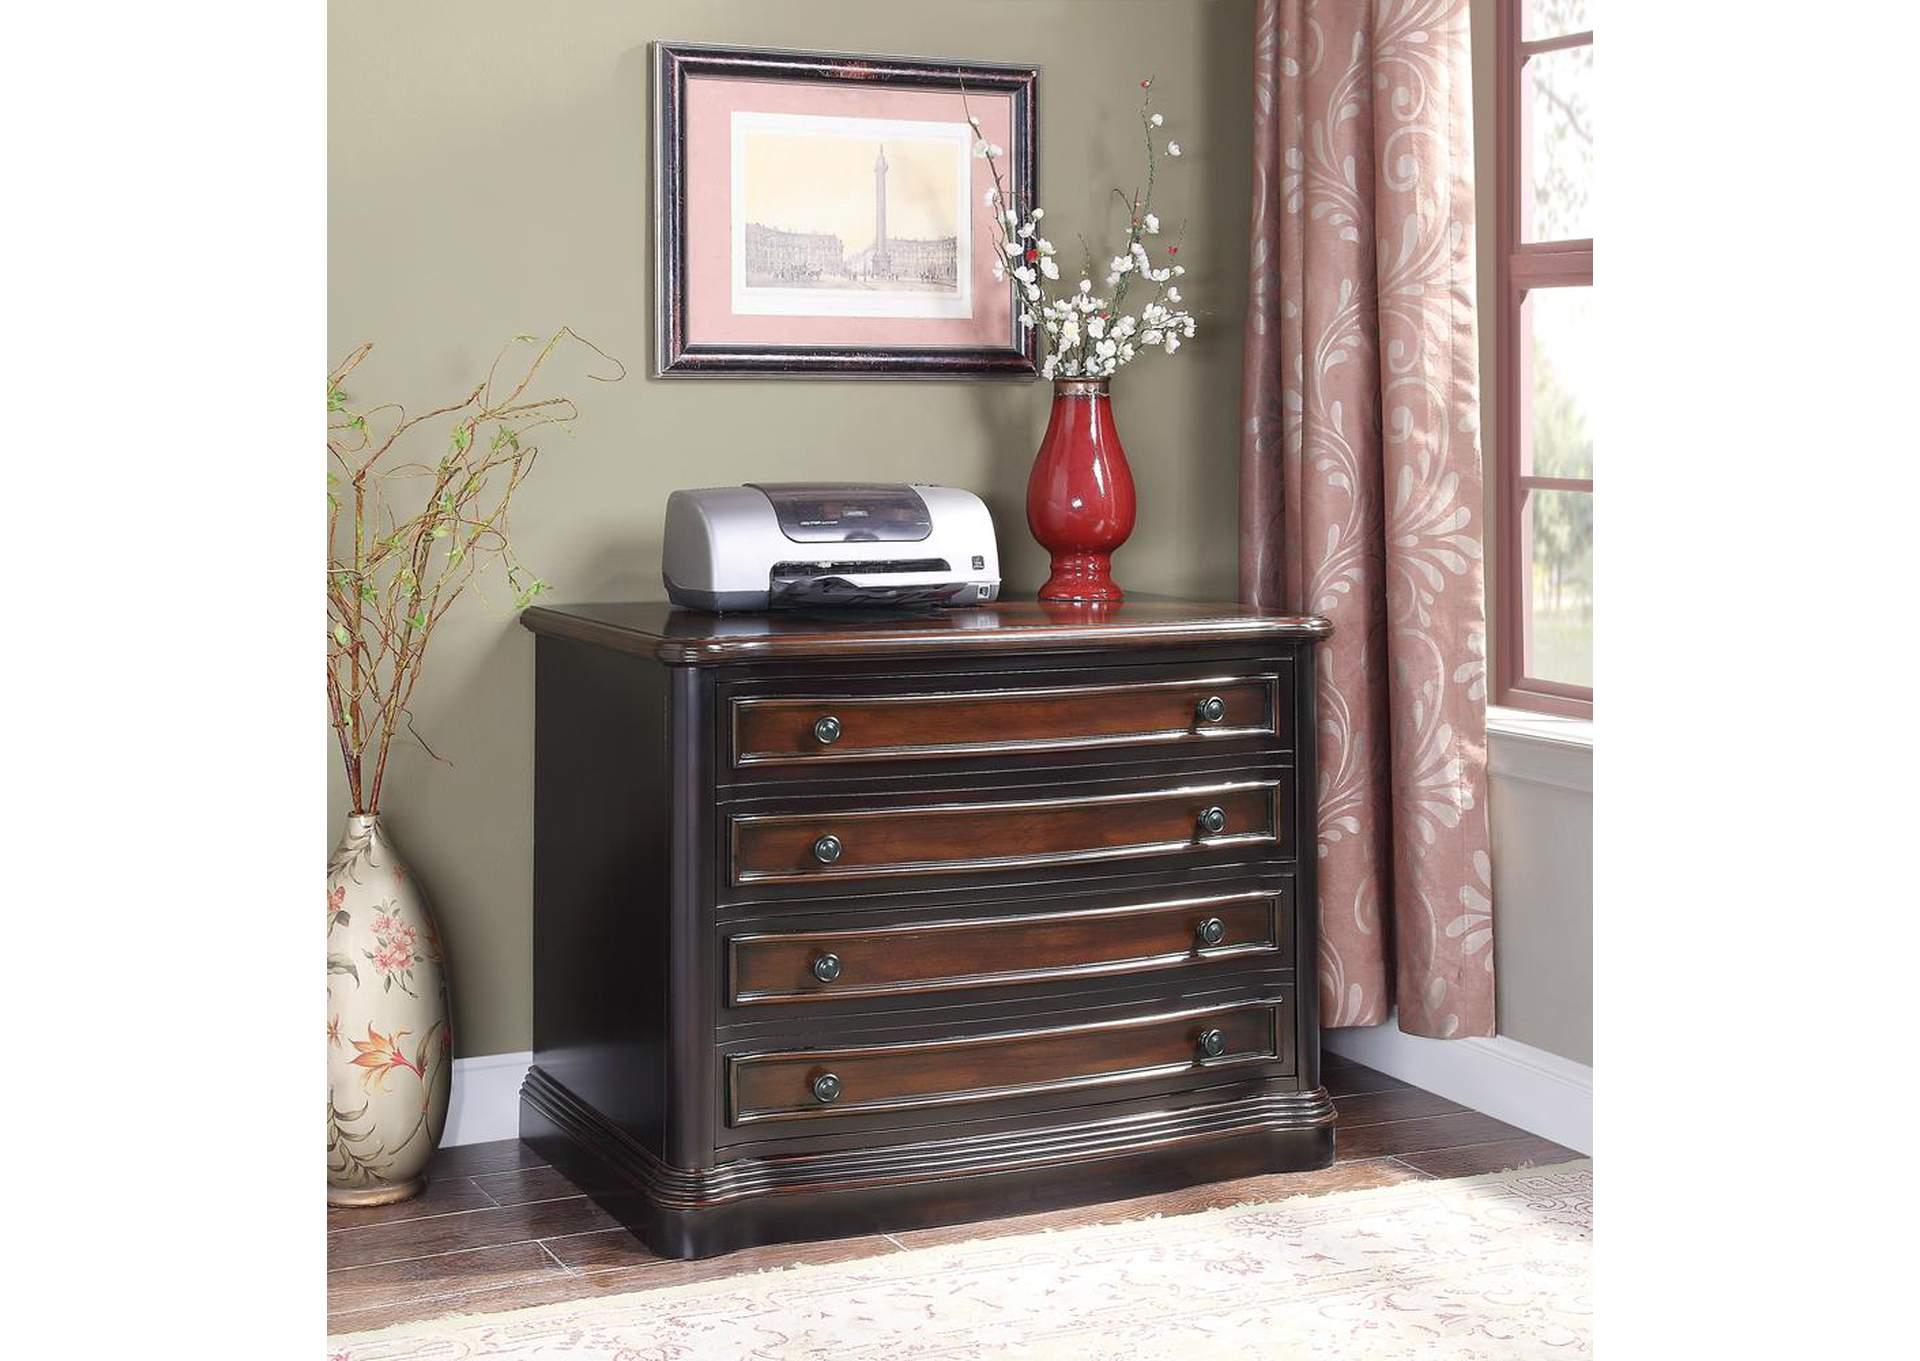 Furniture Palace Black Cherry File Cabinet